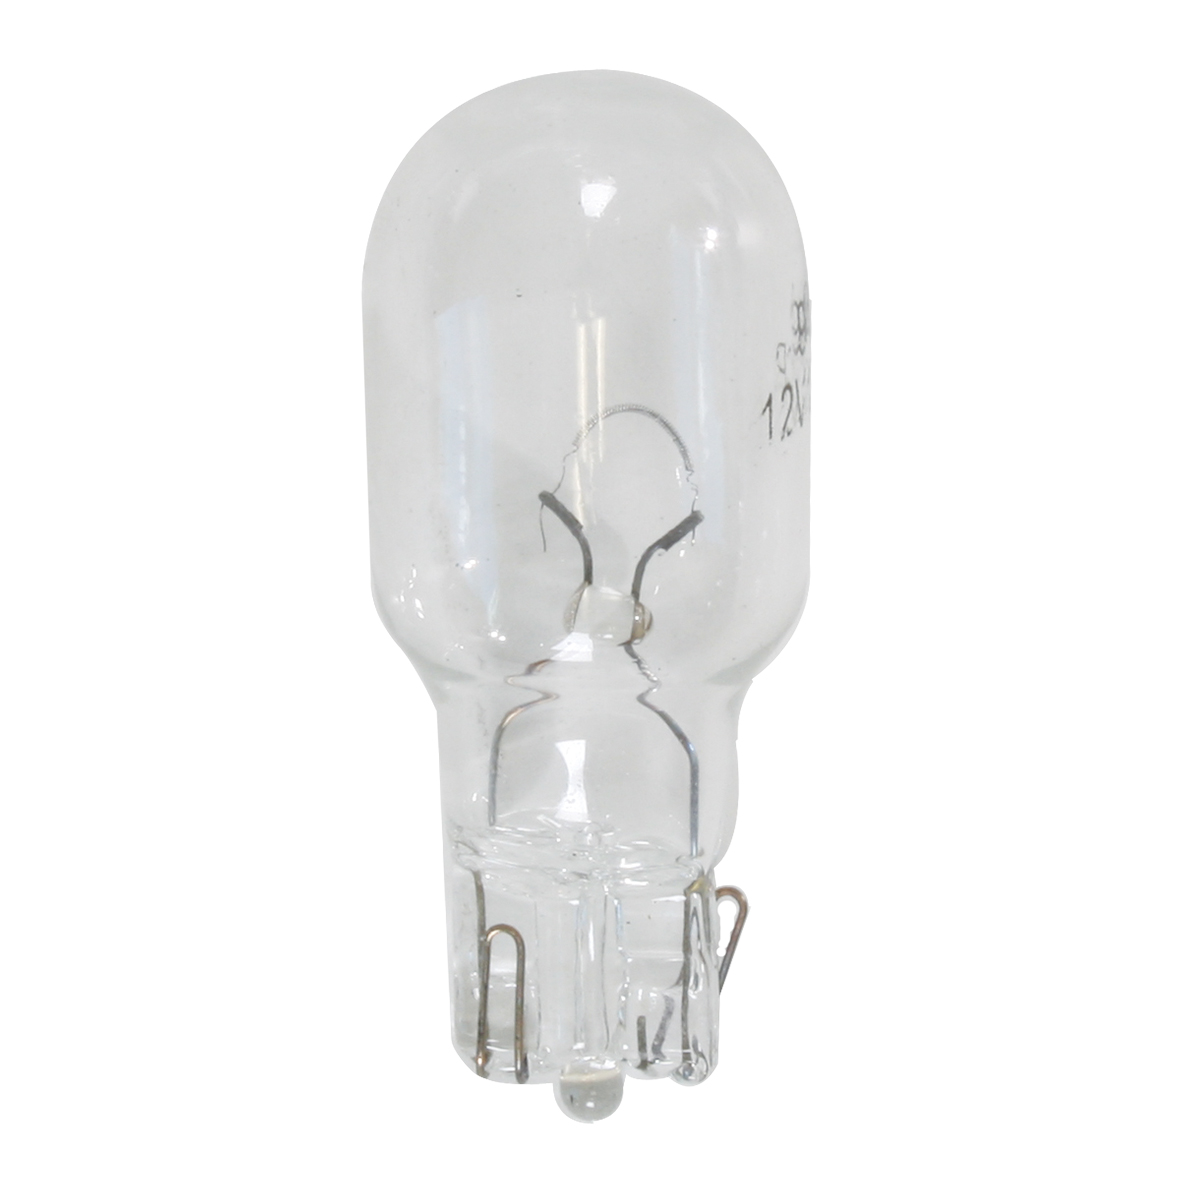 #84052 Miniature Replacement #912 Light Bulb